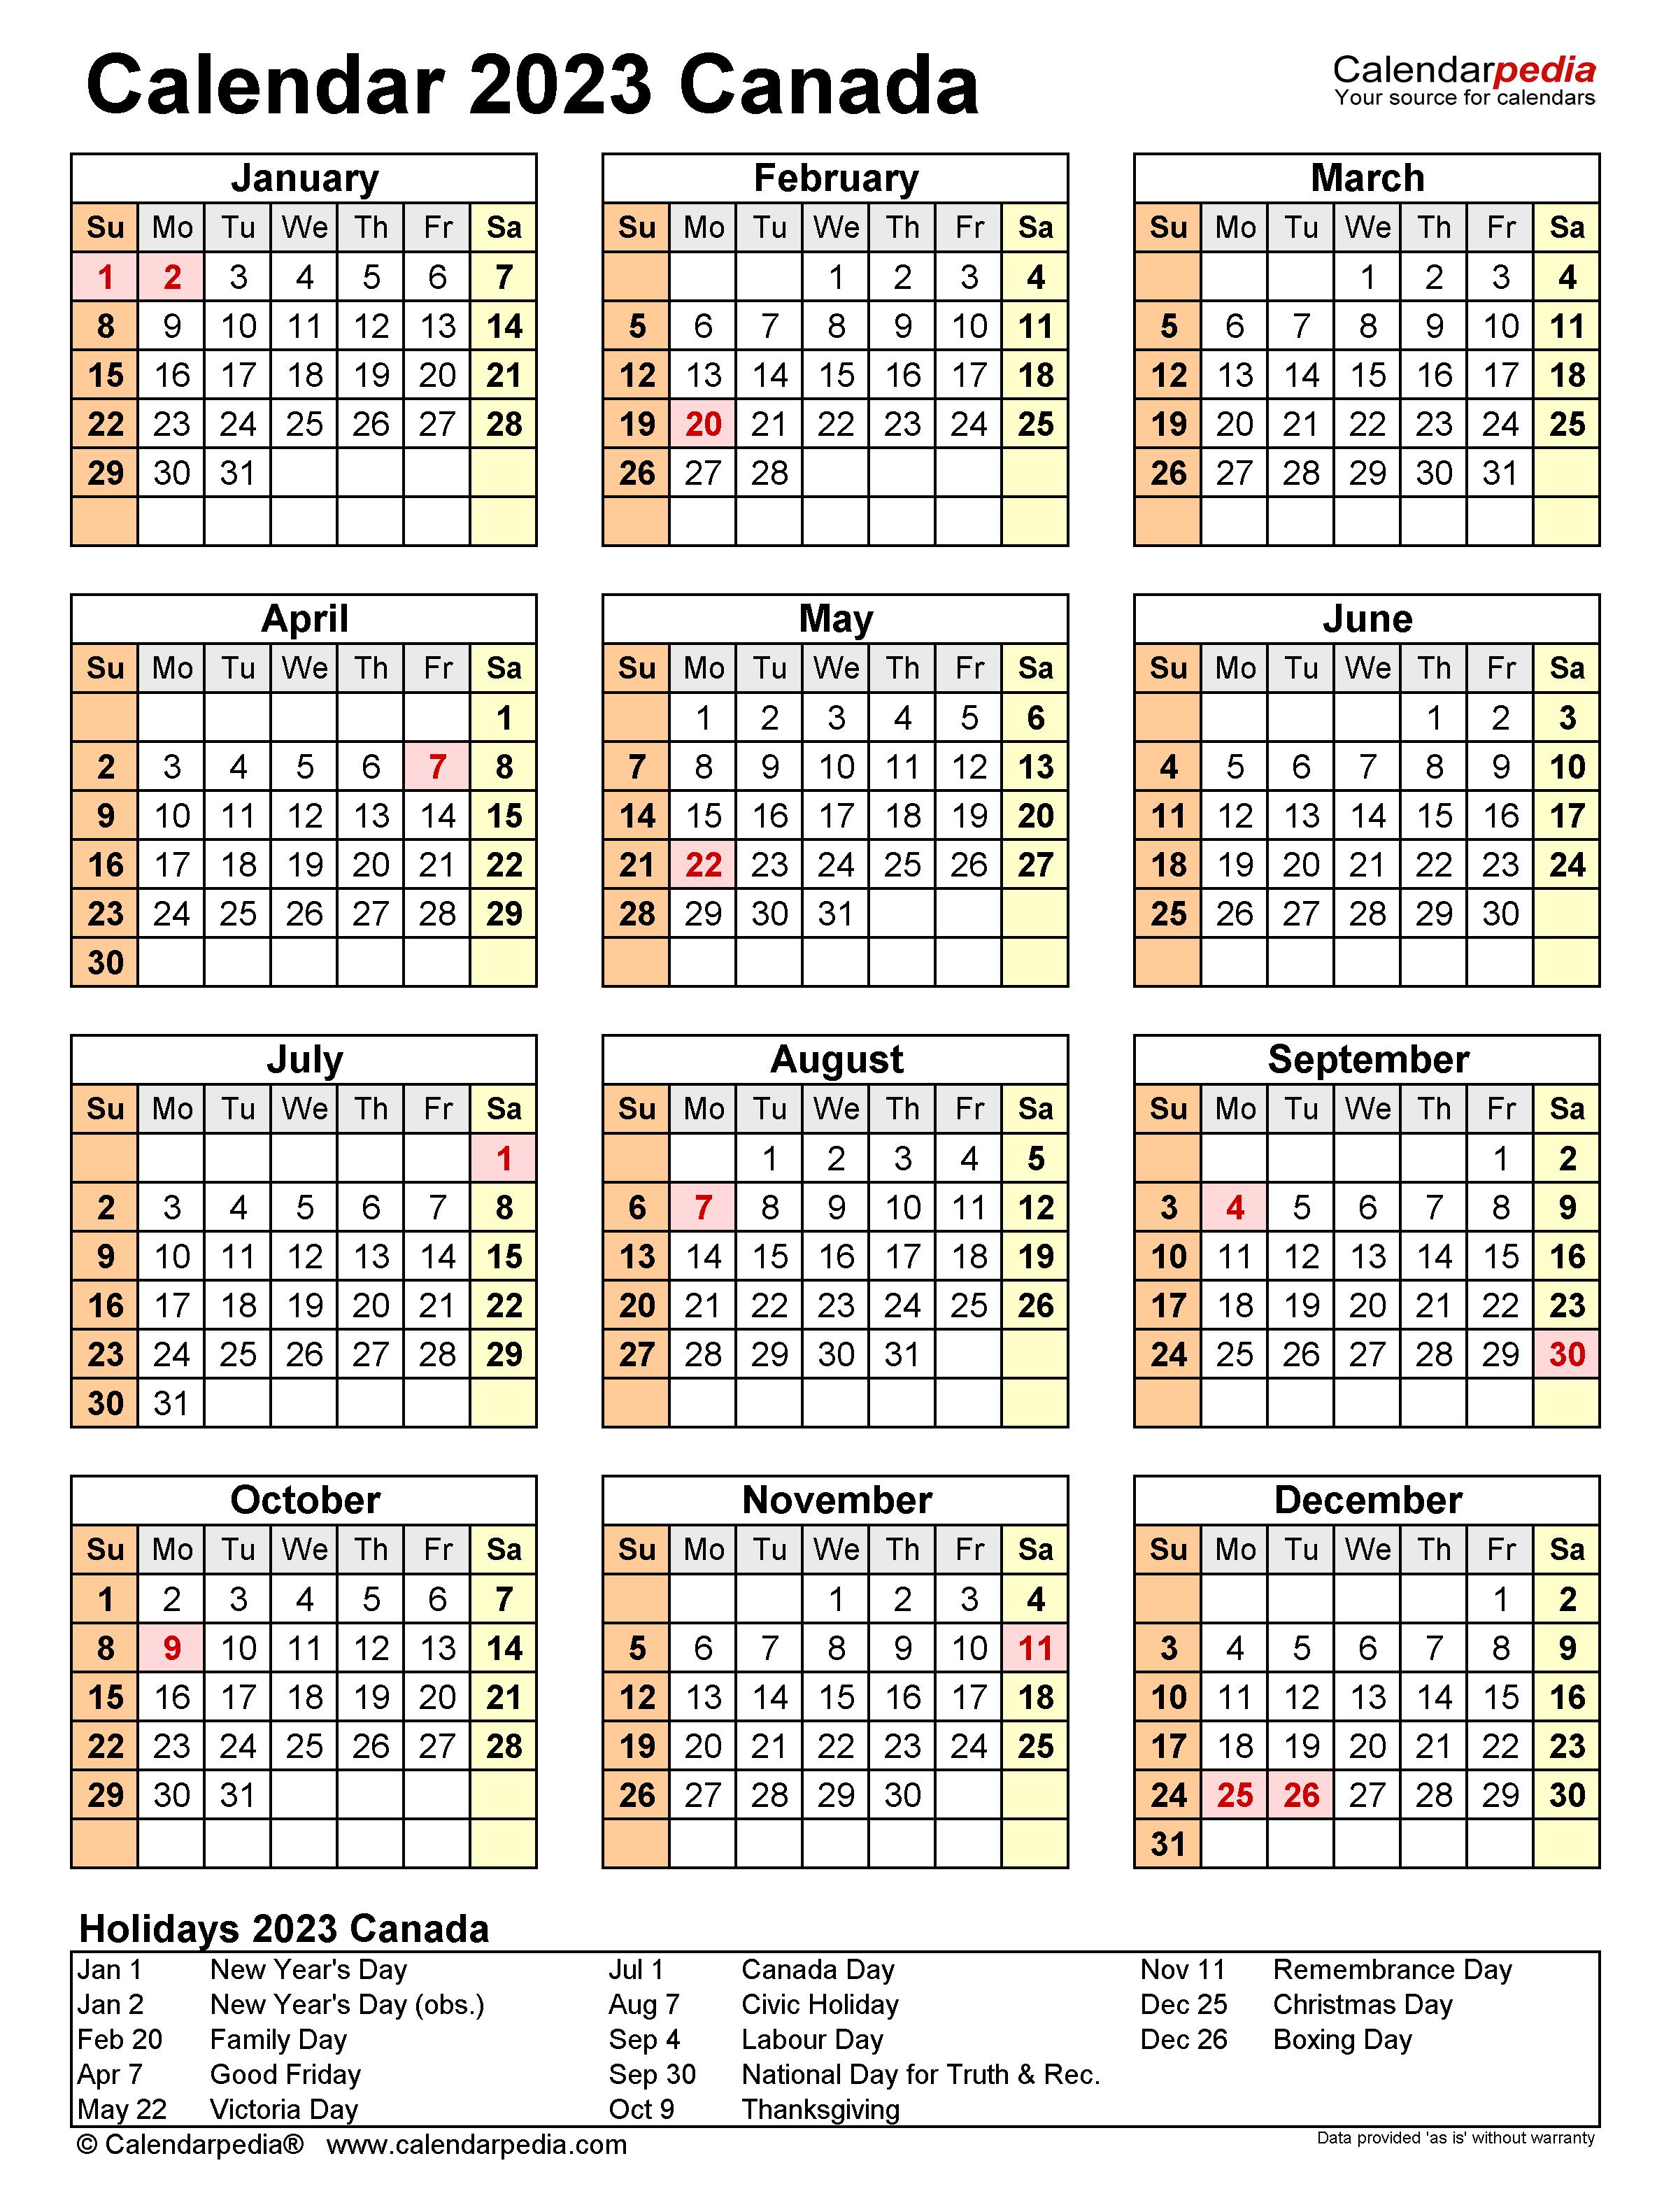 Canada Calendar 2023 - Free Printable PDF templates